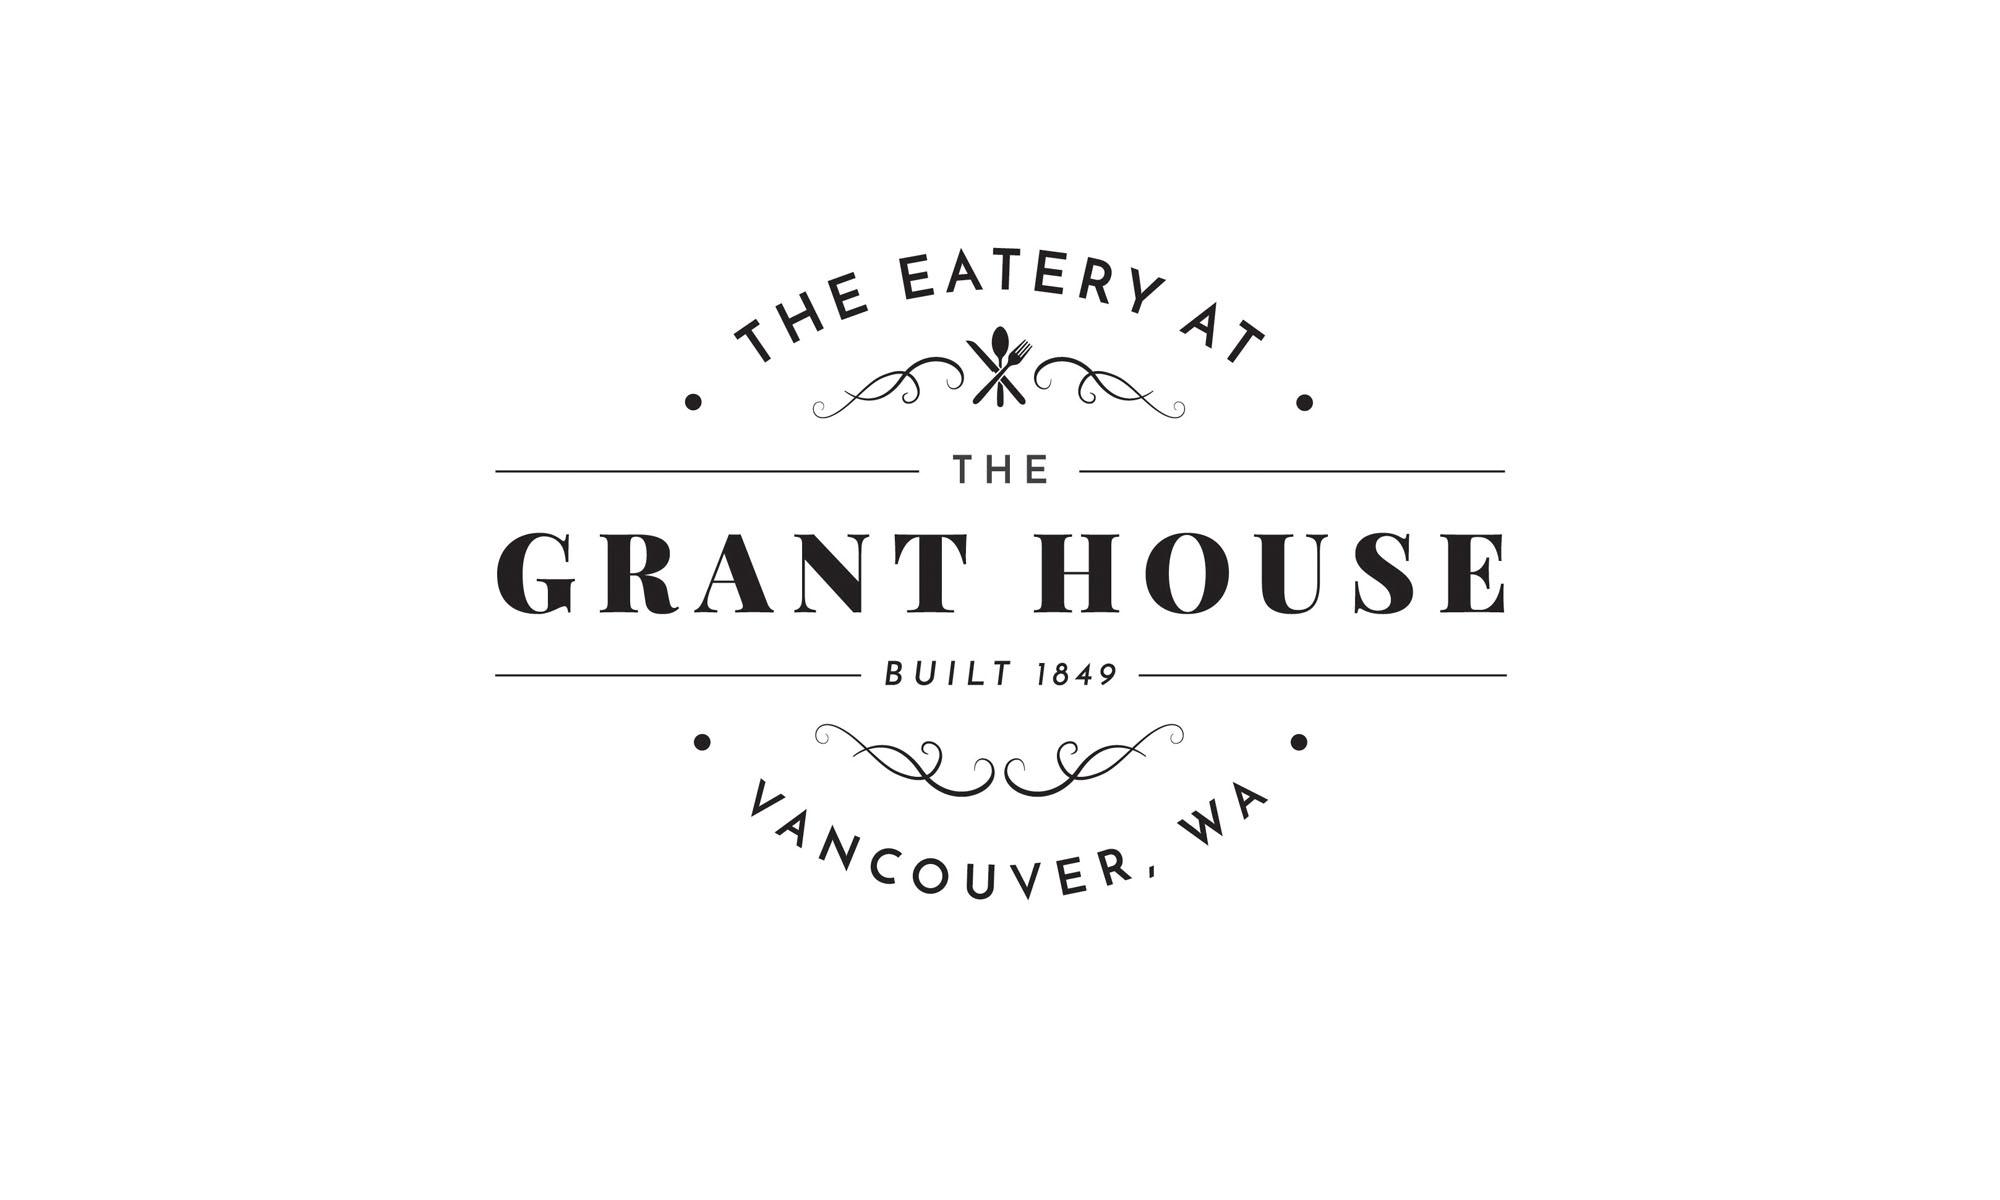 GrantHouse4.jpg